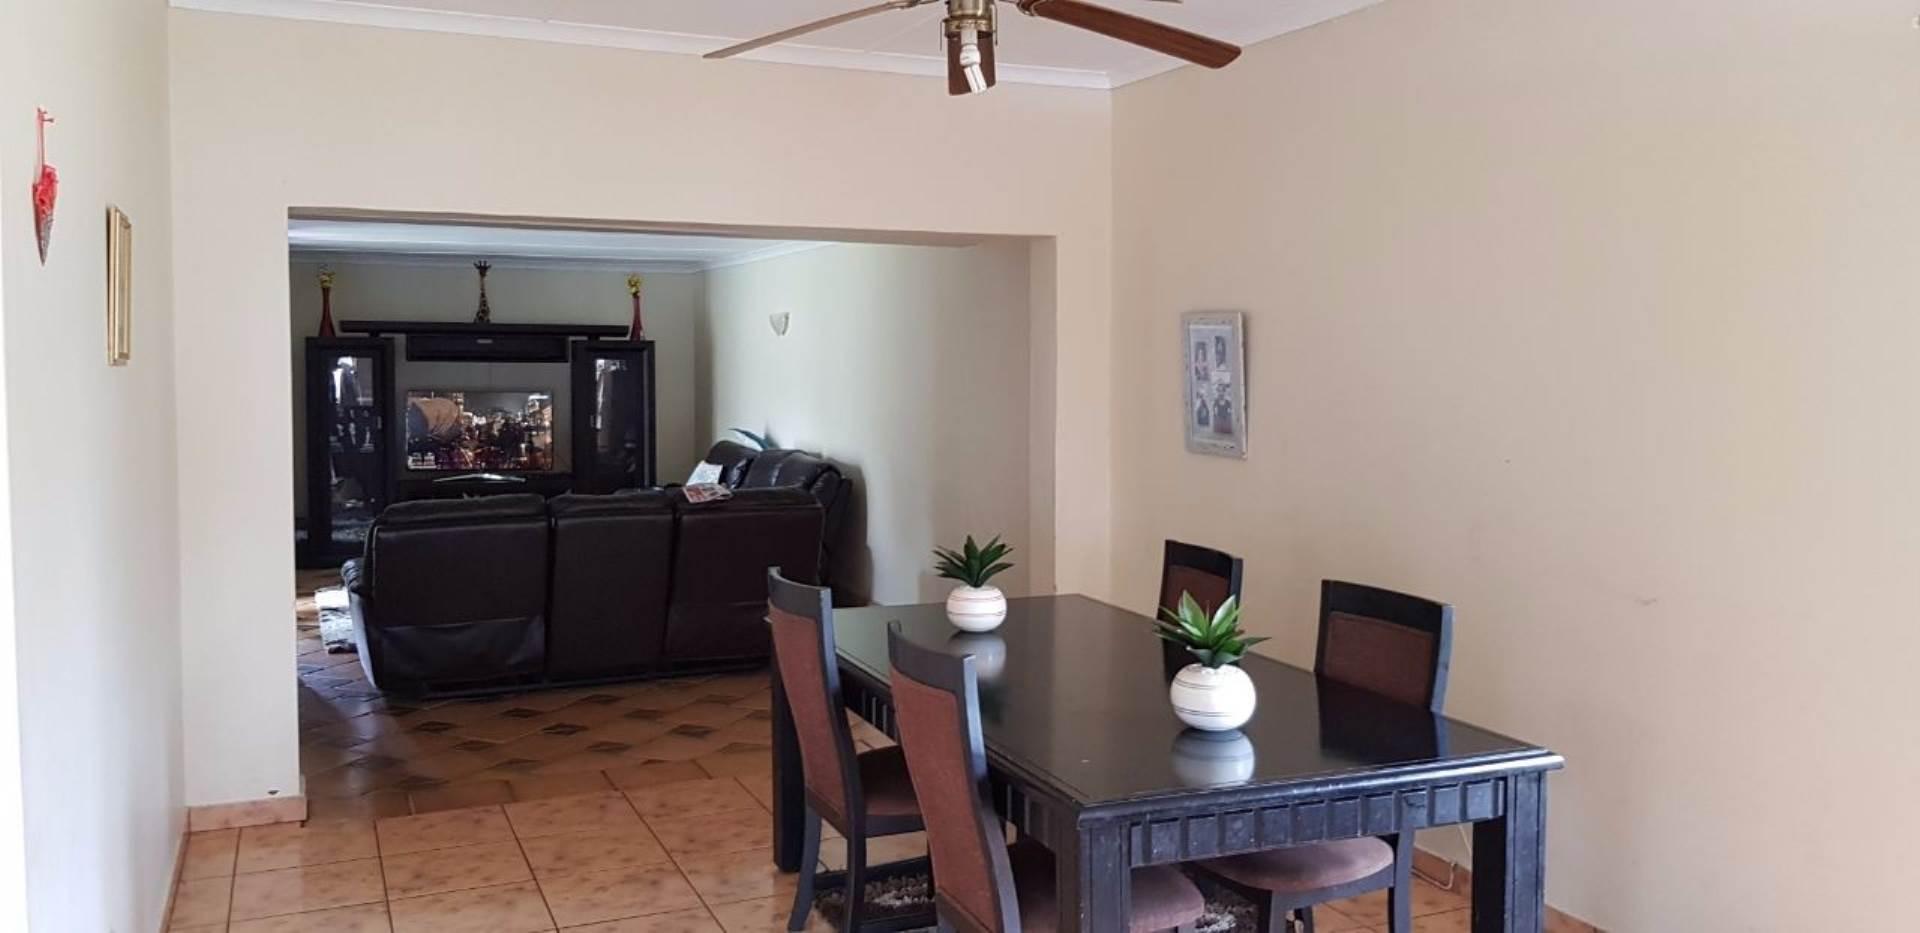 3 BedroomTownhouse For Sale In Kwambonambi